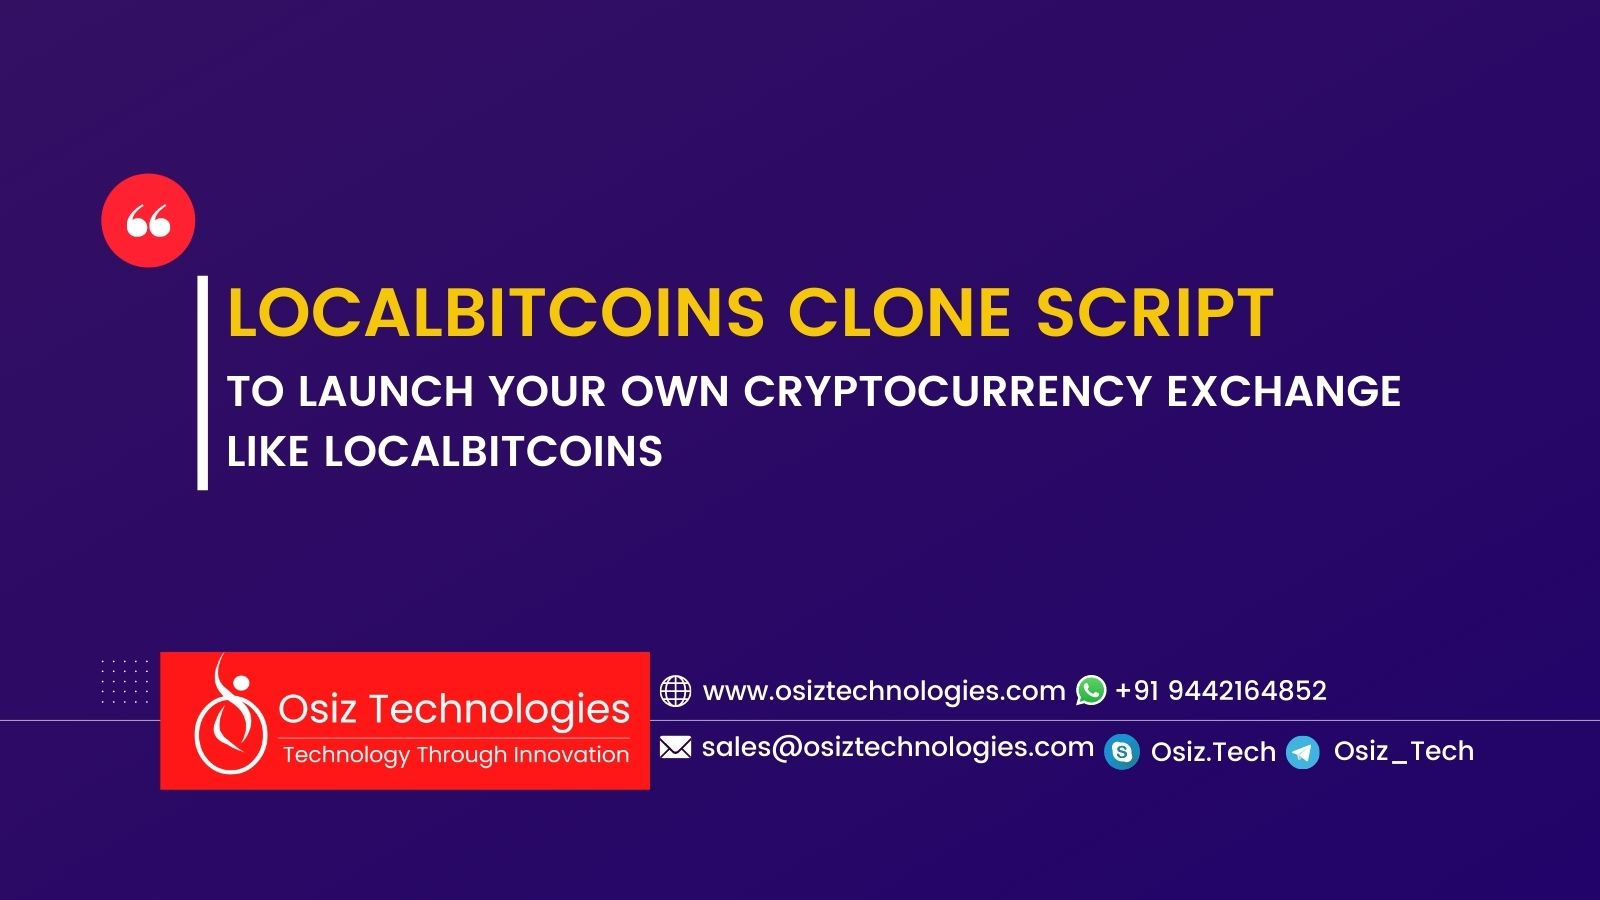 Localbitcoins api php scripts nba tips betting expert